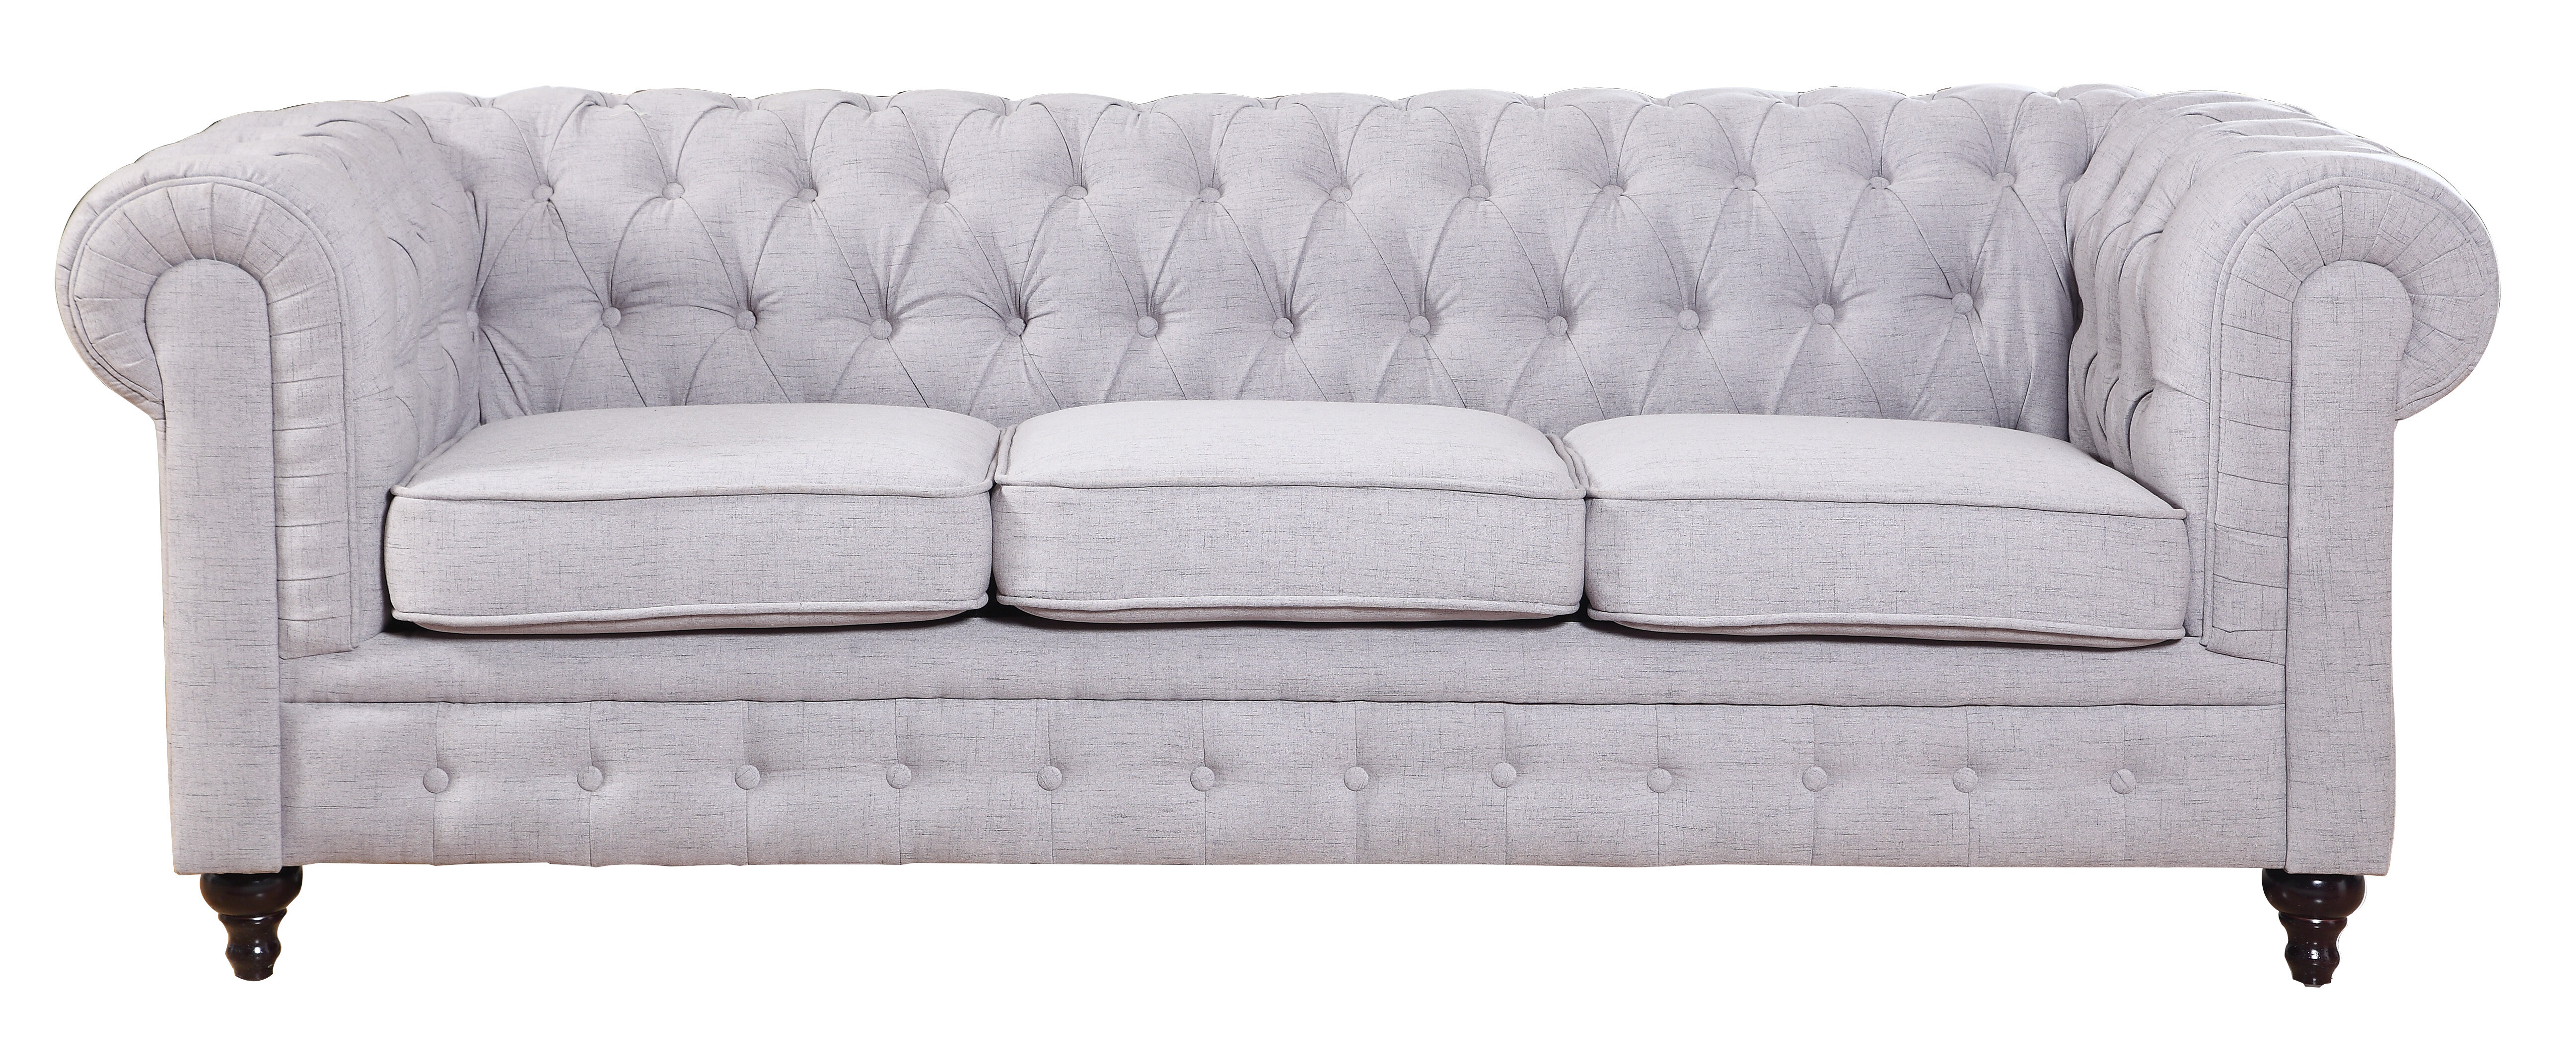 Willa Arlo Interiors Elina Clic Tufted Linen Fabric Chesterfield Sofa Reviews Wayfair